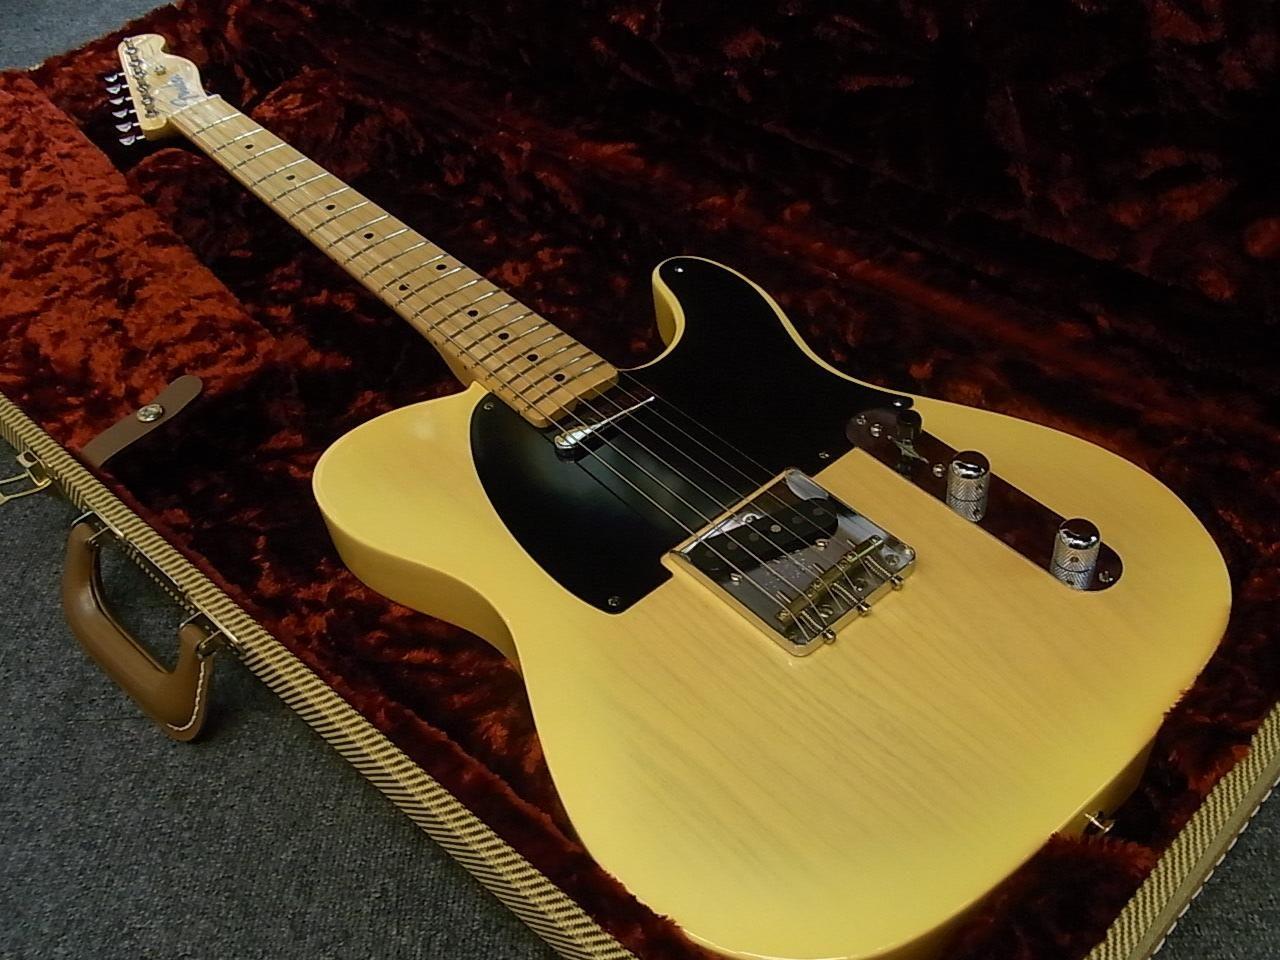 Fender USA All New American Vintage '52 Telecaster